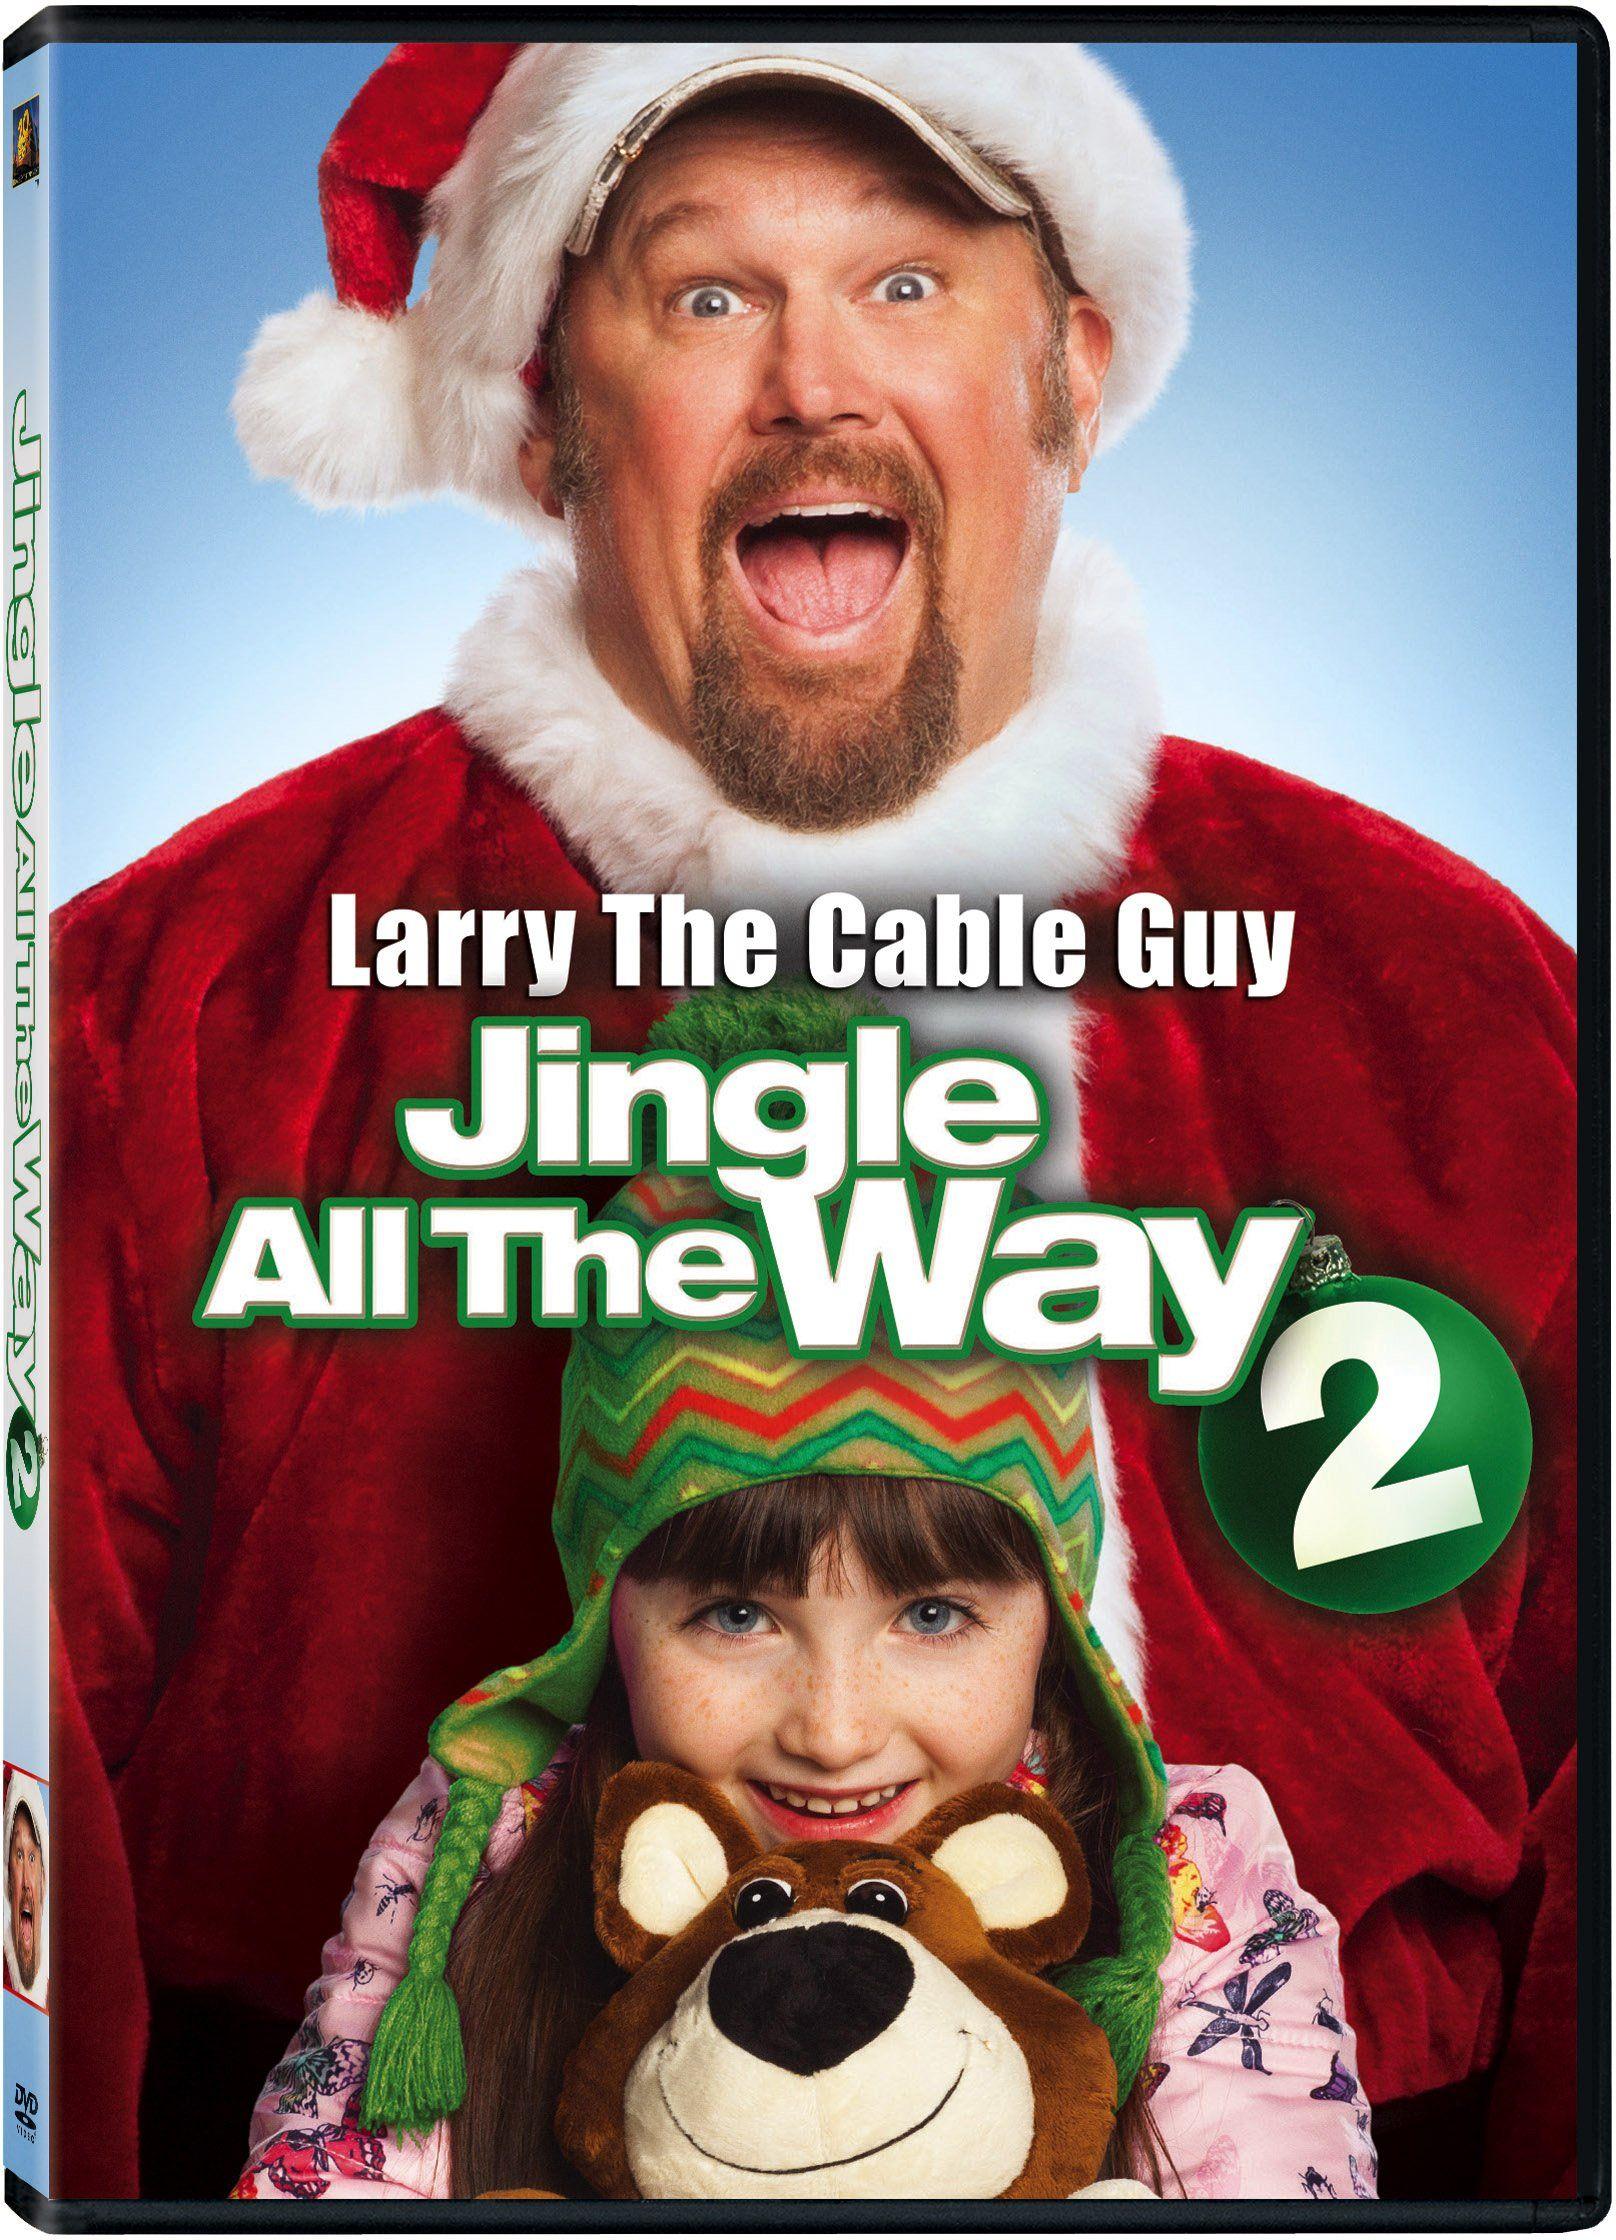 Jingle All the Way 2 December 2, 2014 2014 DVD/Bluray